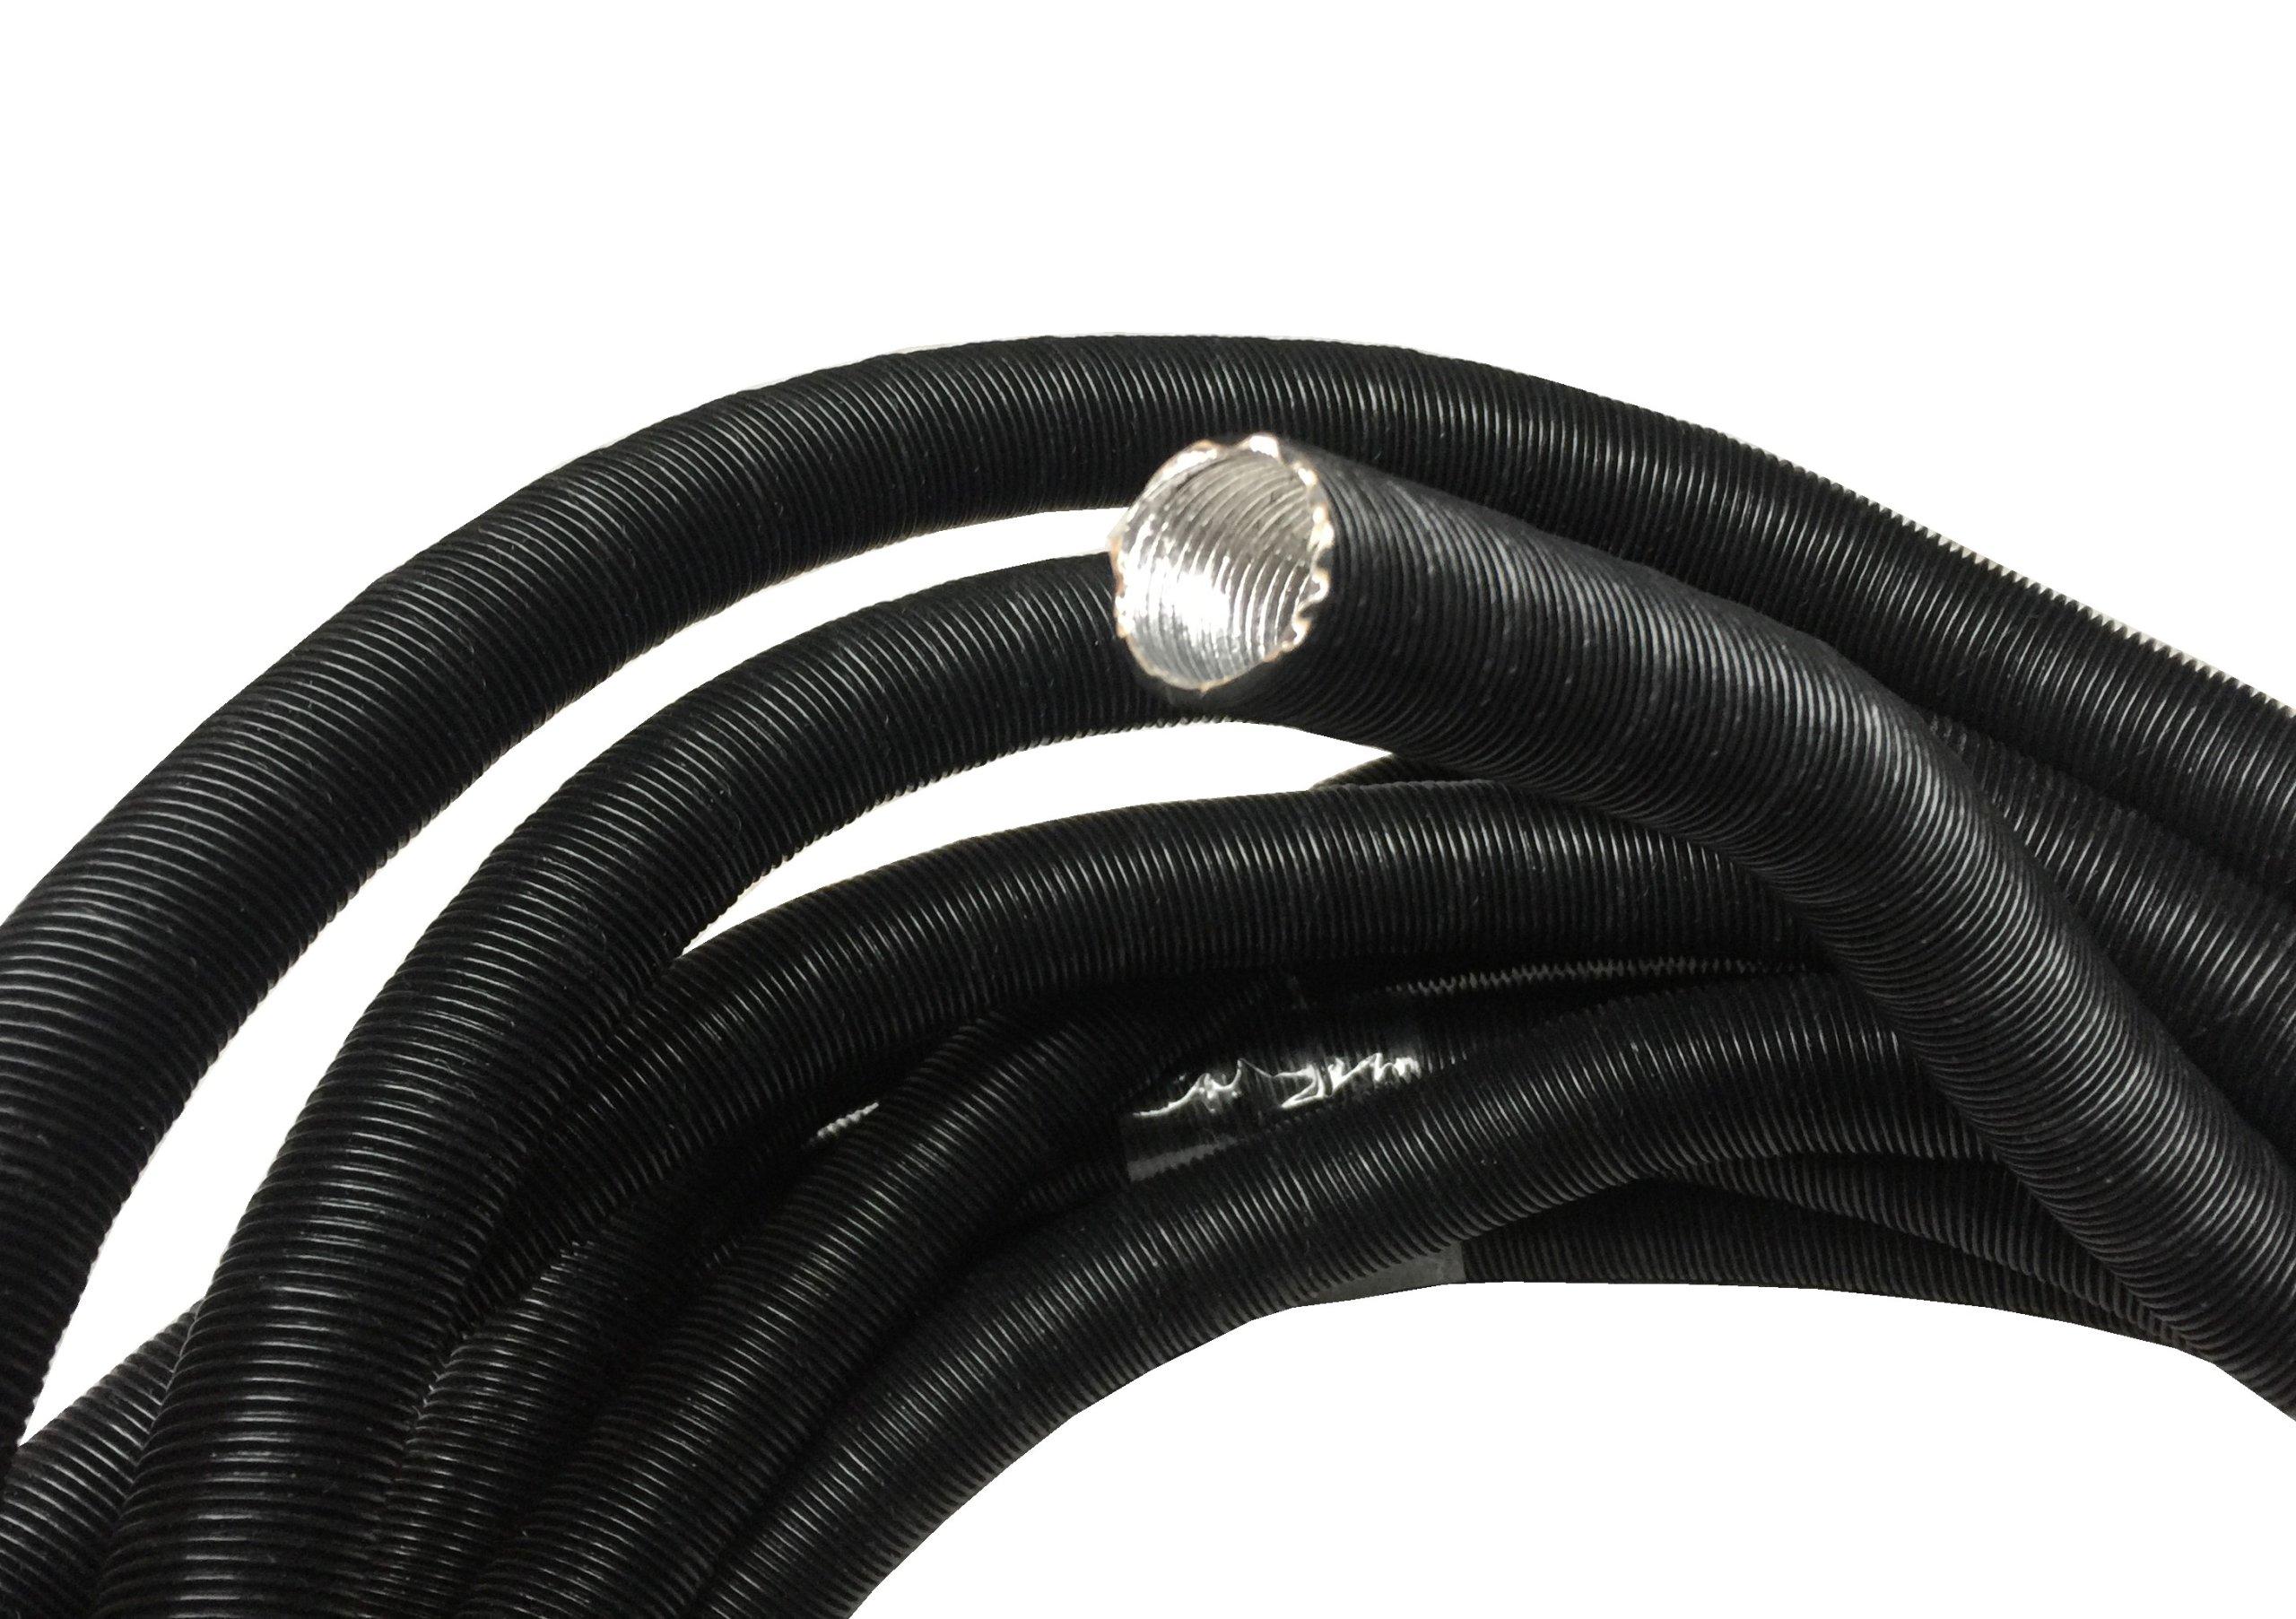 труба кабель воздуха webasto eberspacher fi20mm